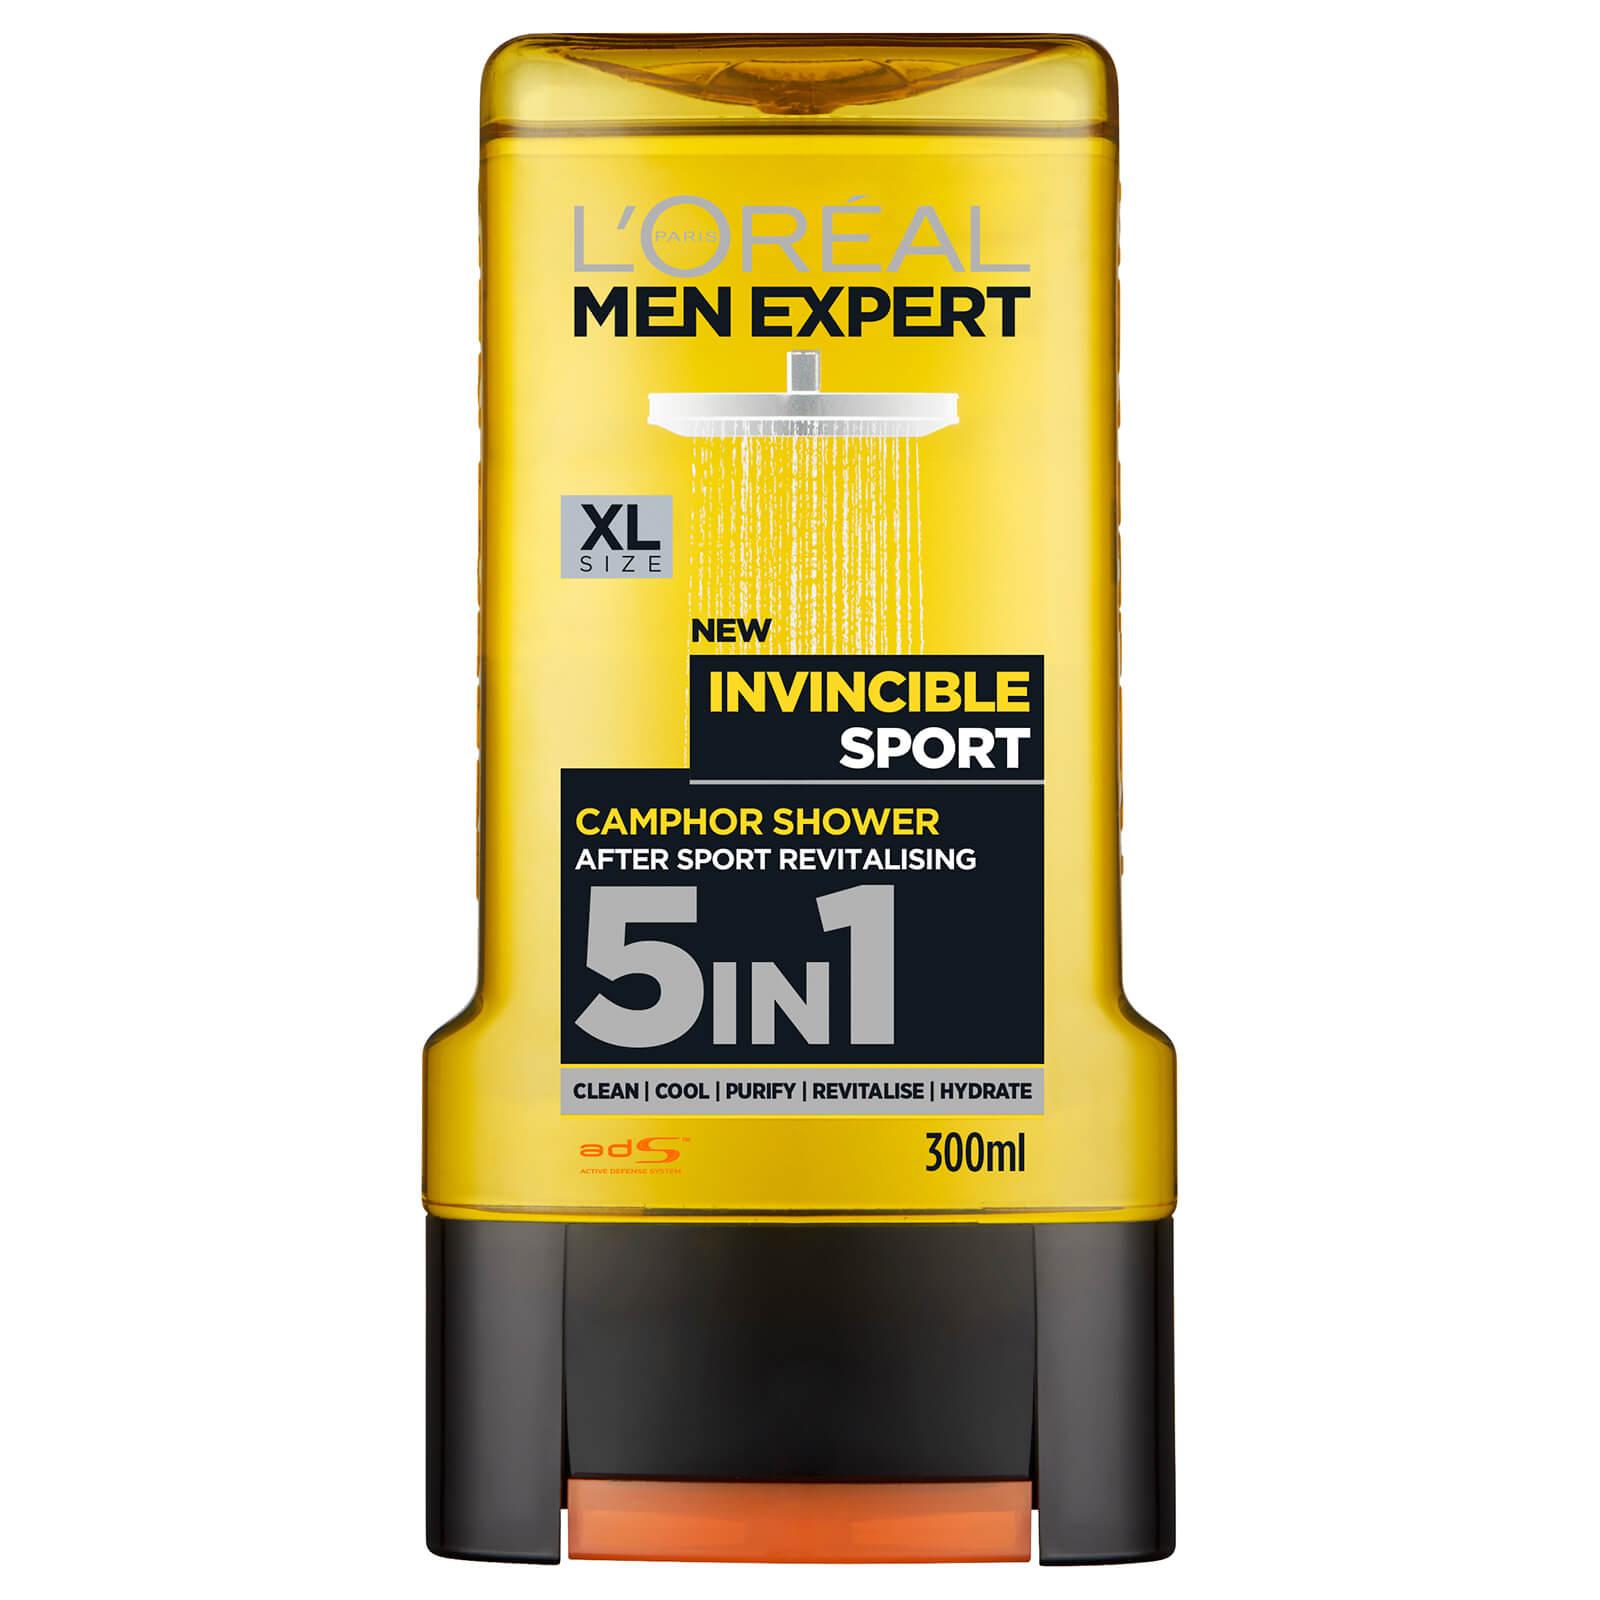 Купить L'Oréal Men Expert Invincible Sport 5-in-1 Shower Gel 300ml